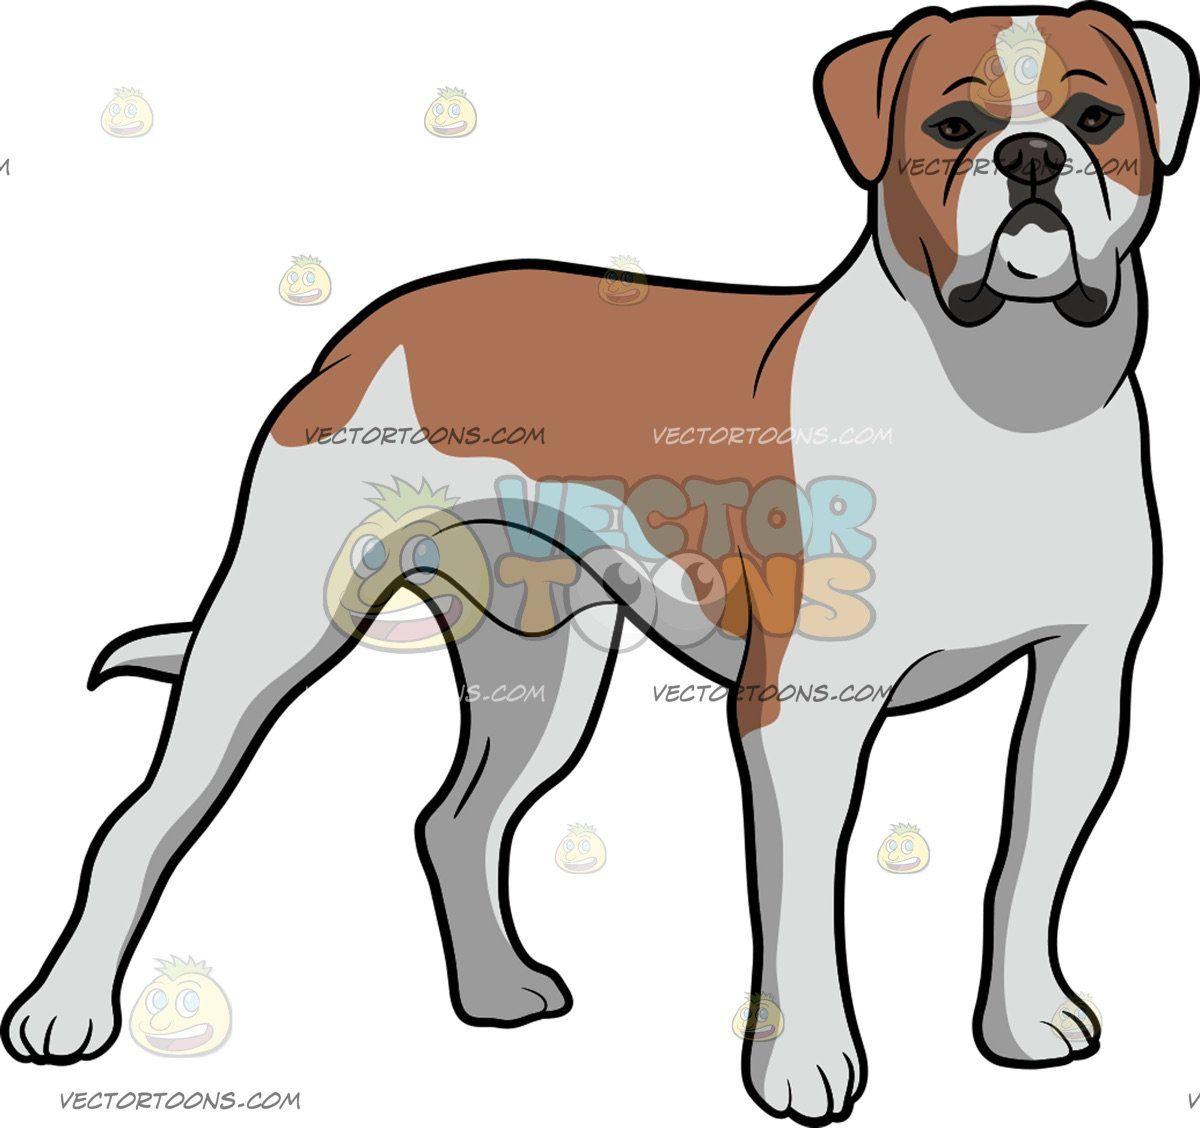 An American Bulldog Staring Ahead: An American bulldog with.